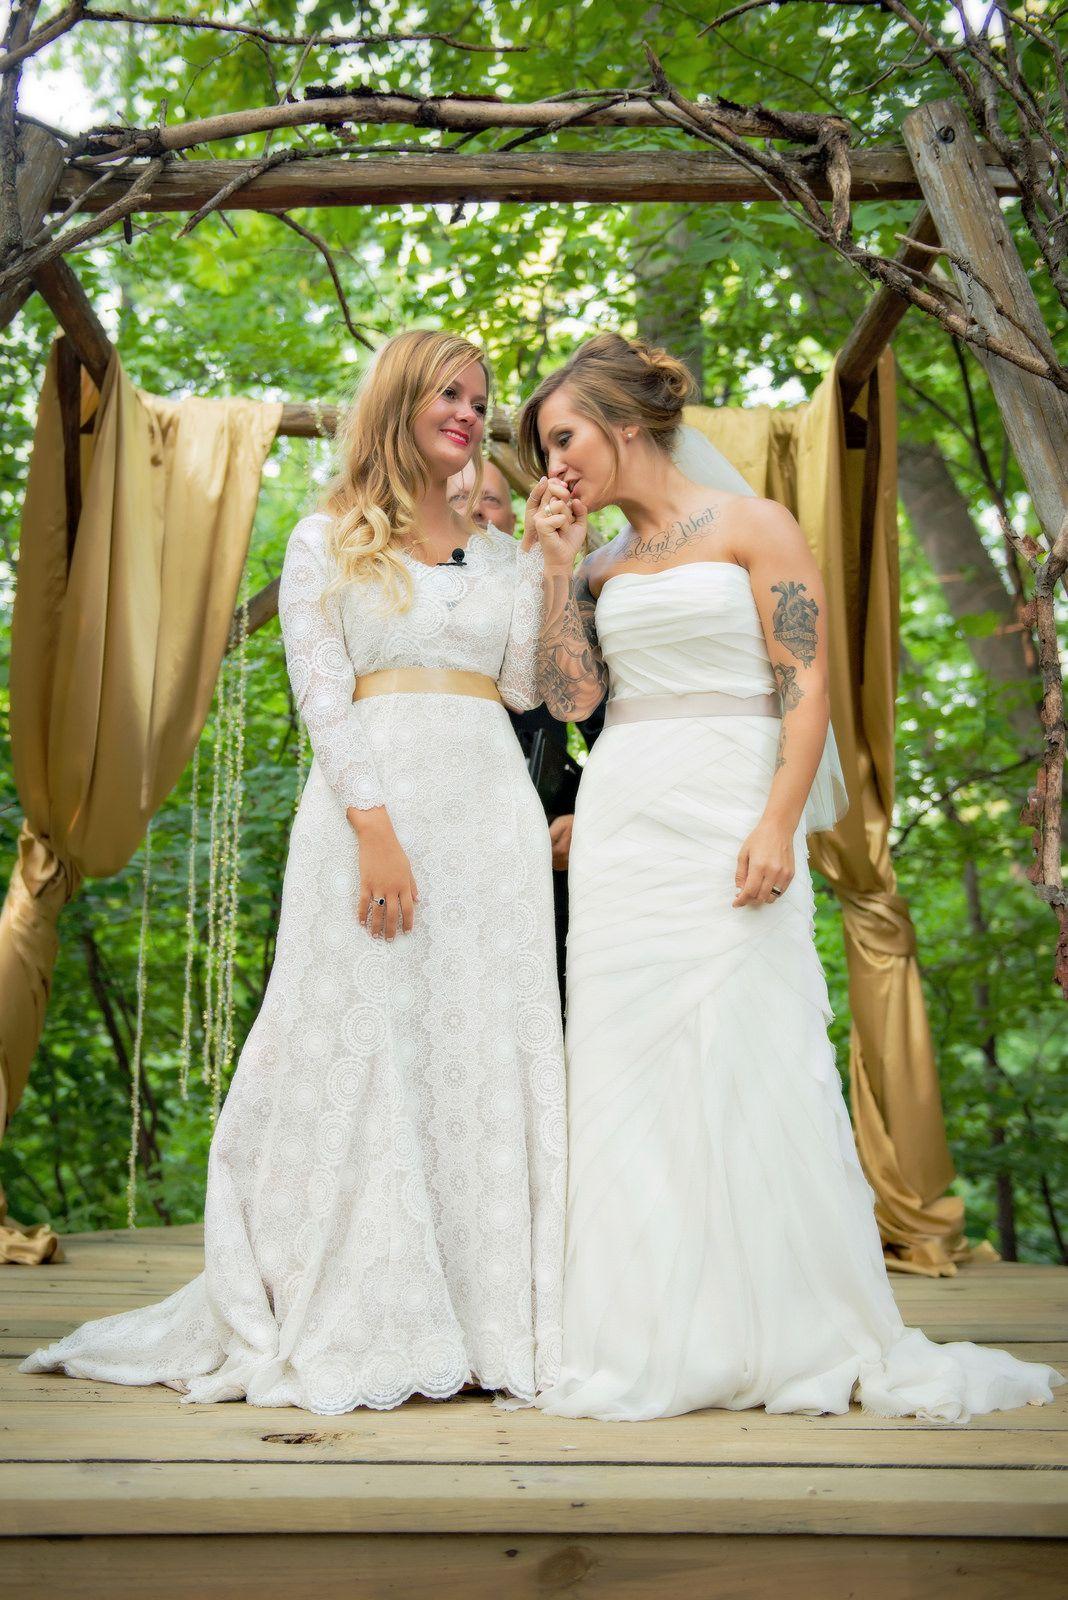 Lesbian wedding picture ideas